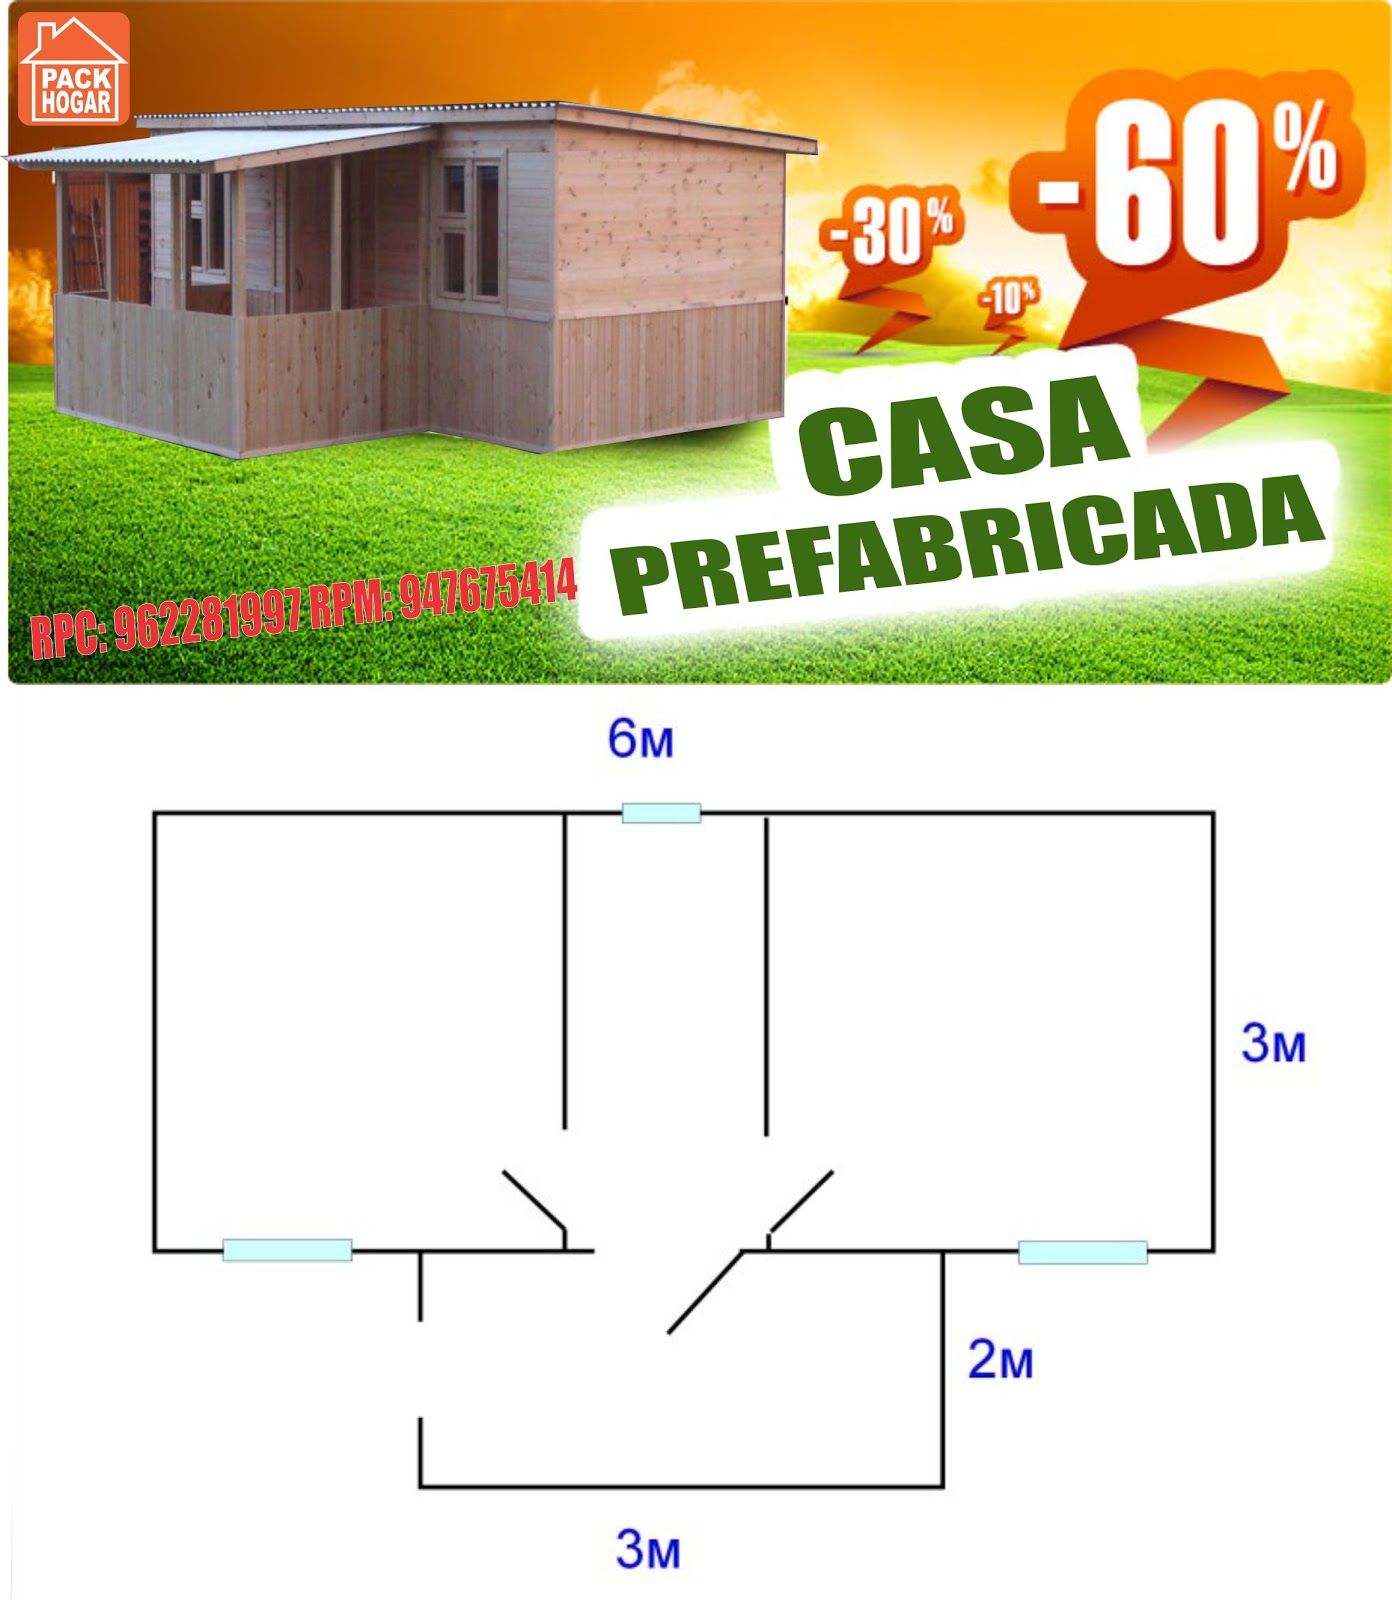 Chapa tu casa prefabricada y asegura tu lote ca ete - Tu casa prefabricada ...